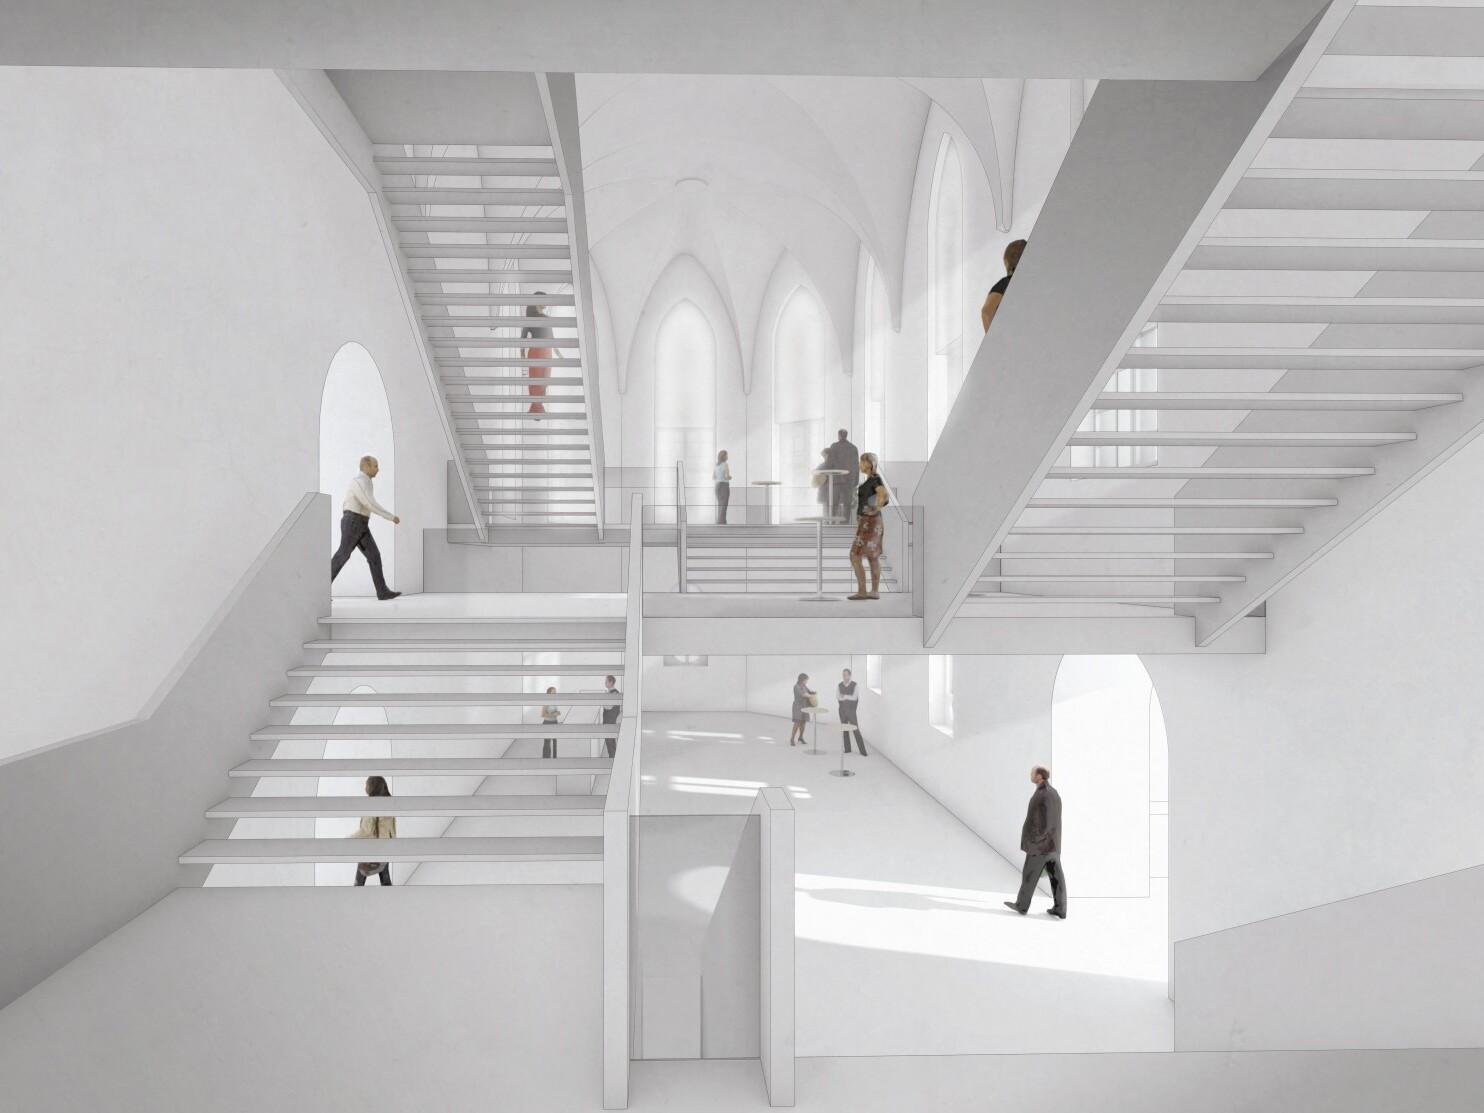 Wettbewerb Stadttheater Amberg, Perspektive Innenraum